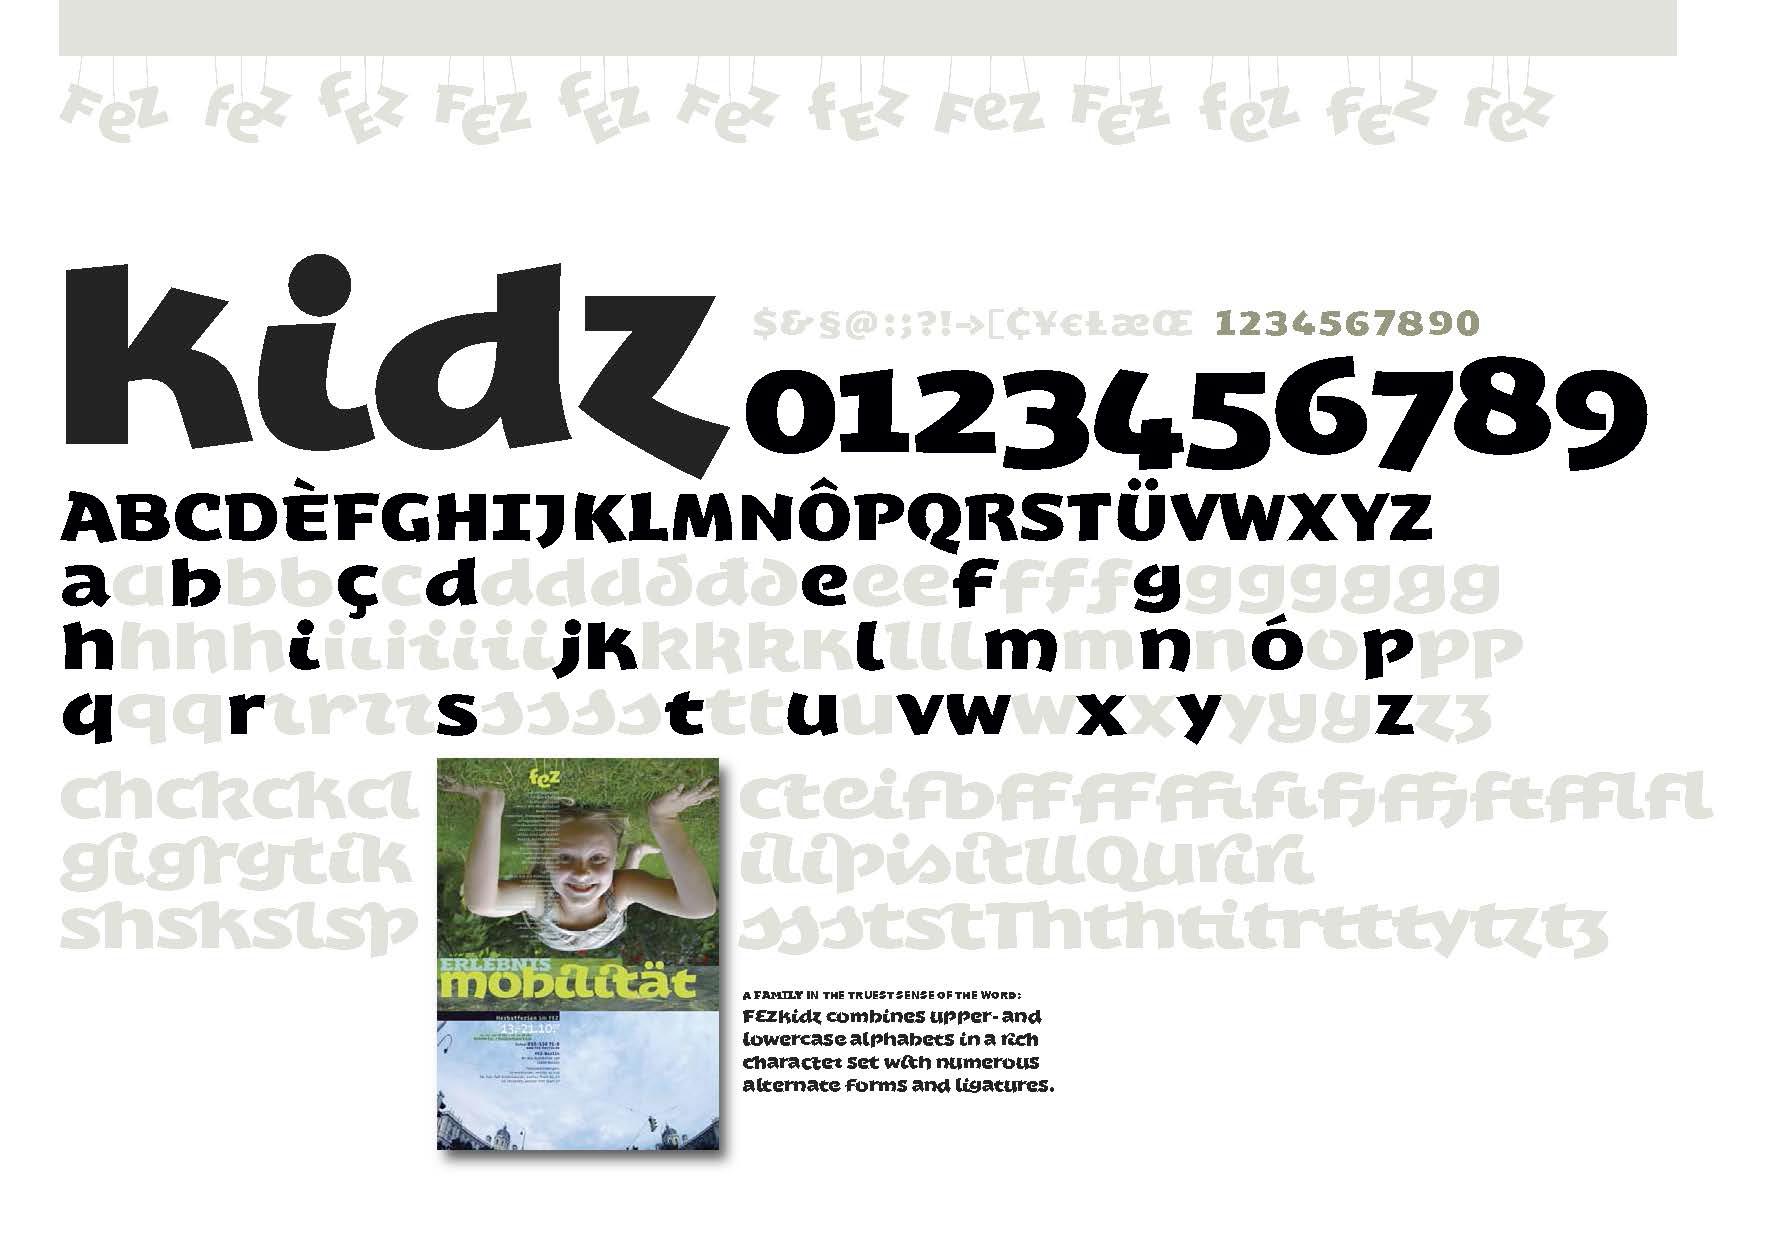 FEZ_FontRGB_kl_Seite_4